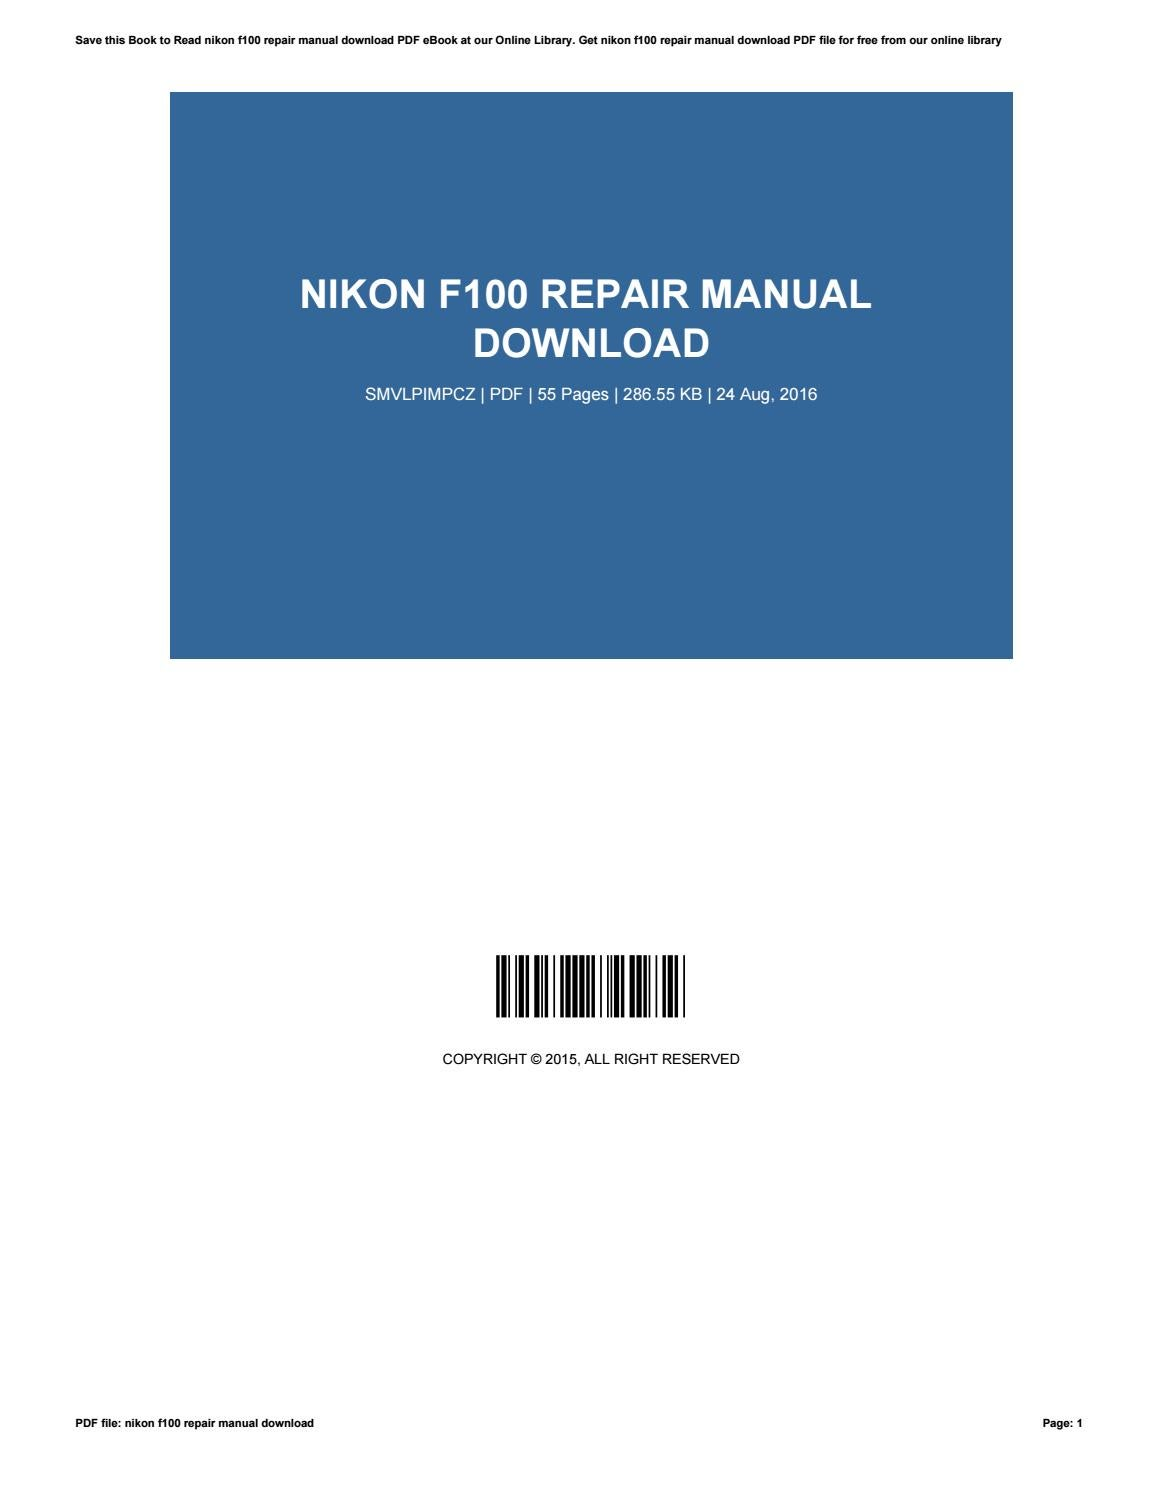 Nikon f100 repair manual download by JamieDowning2171 - Issuu